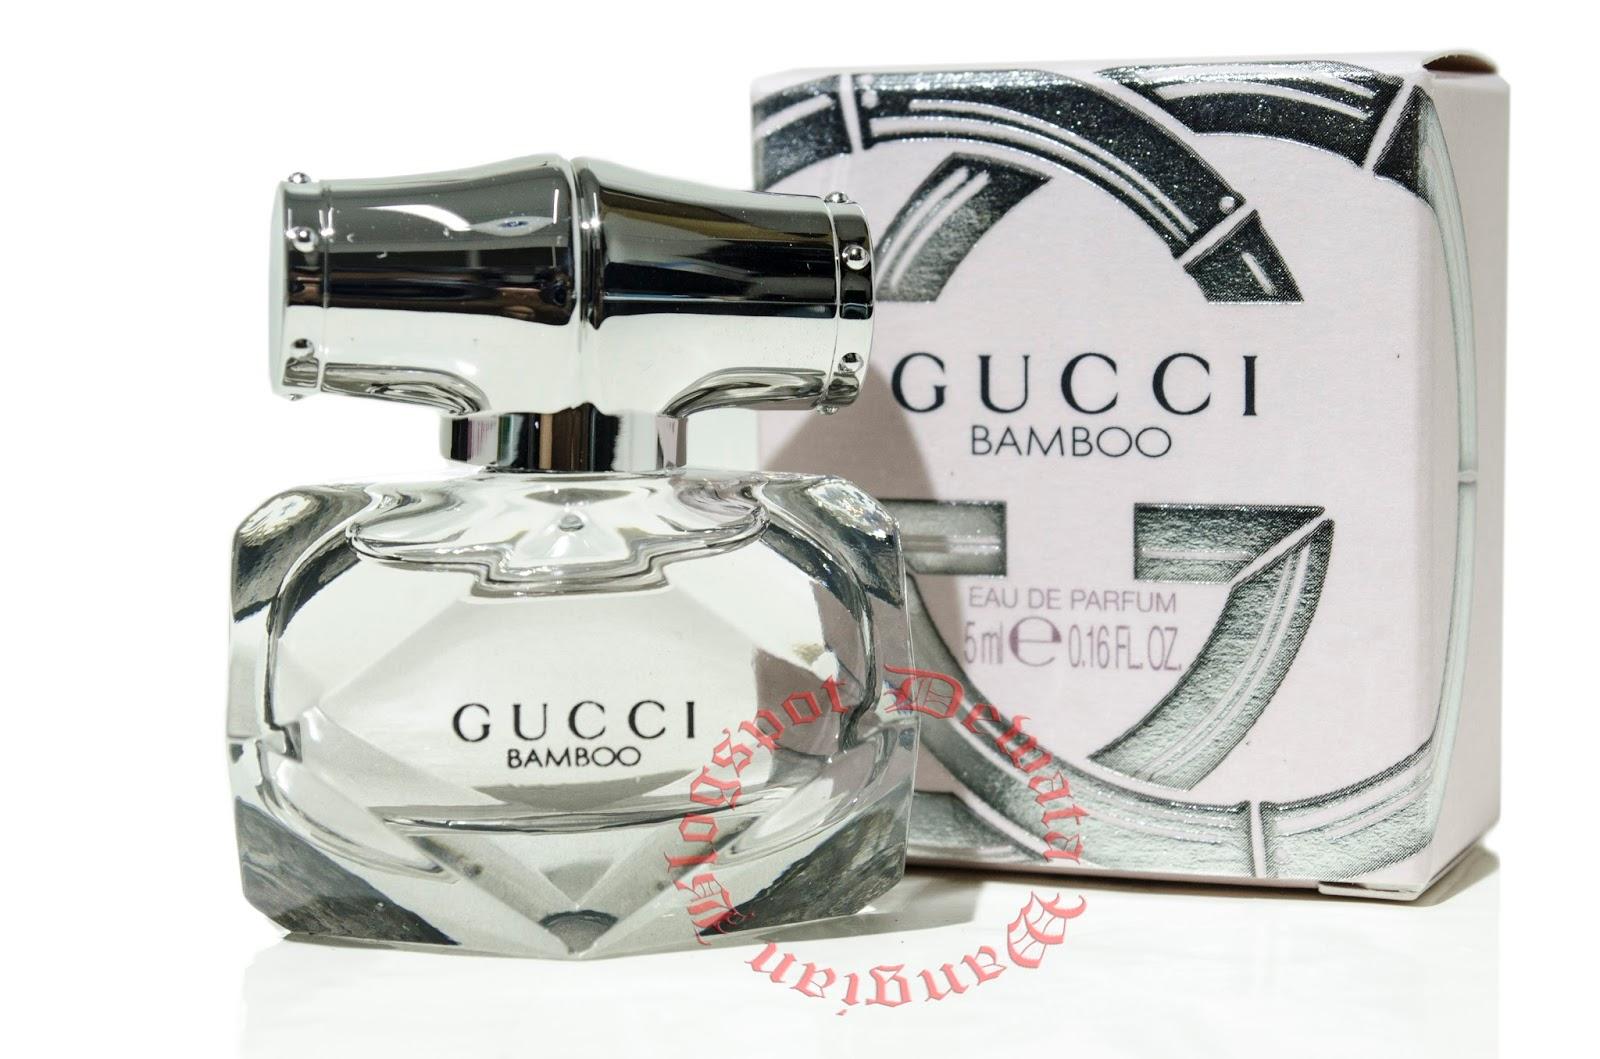 Wangianperfume Cosmetic Original Terbaik Gucci Bamboo Miniature